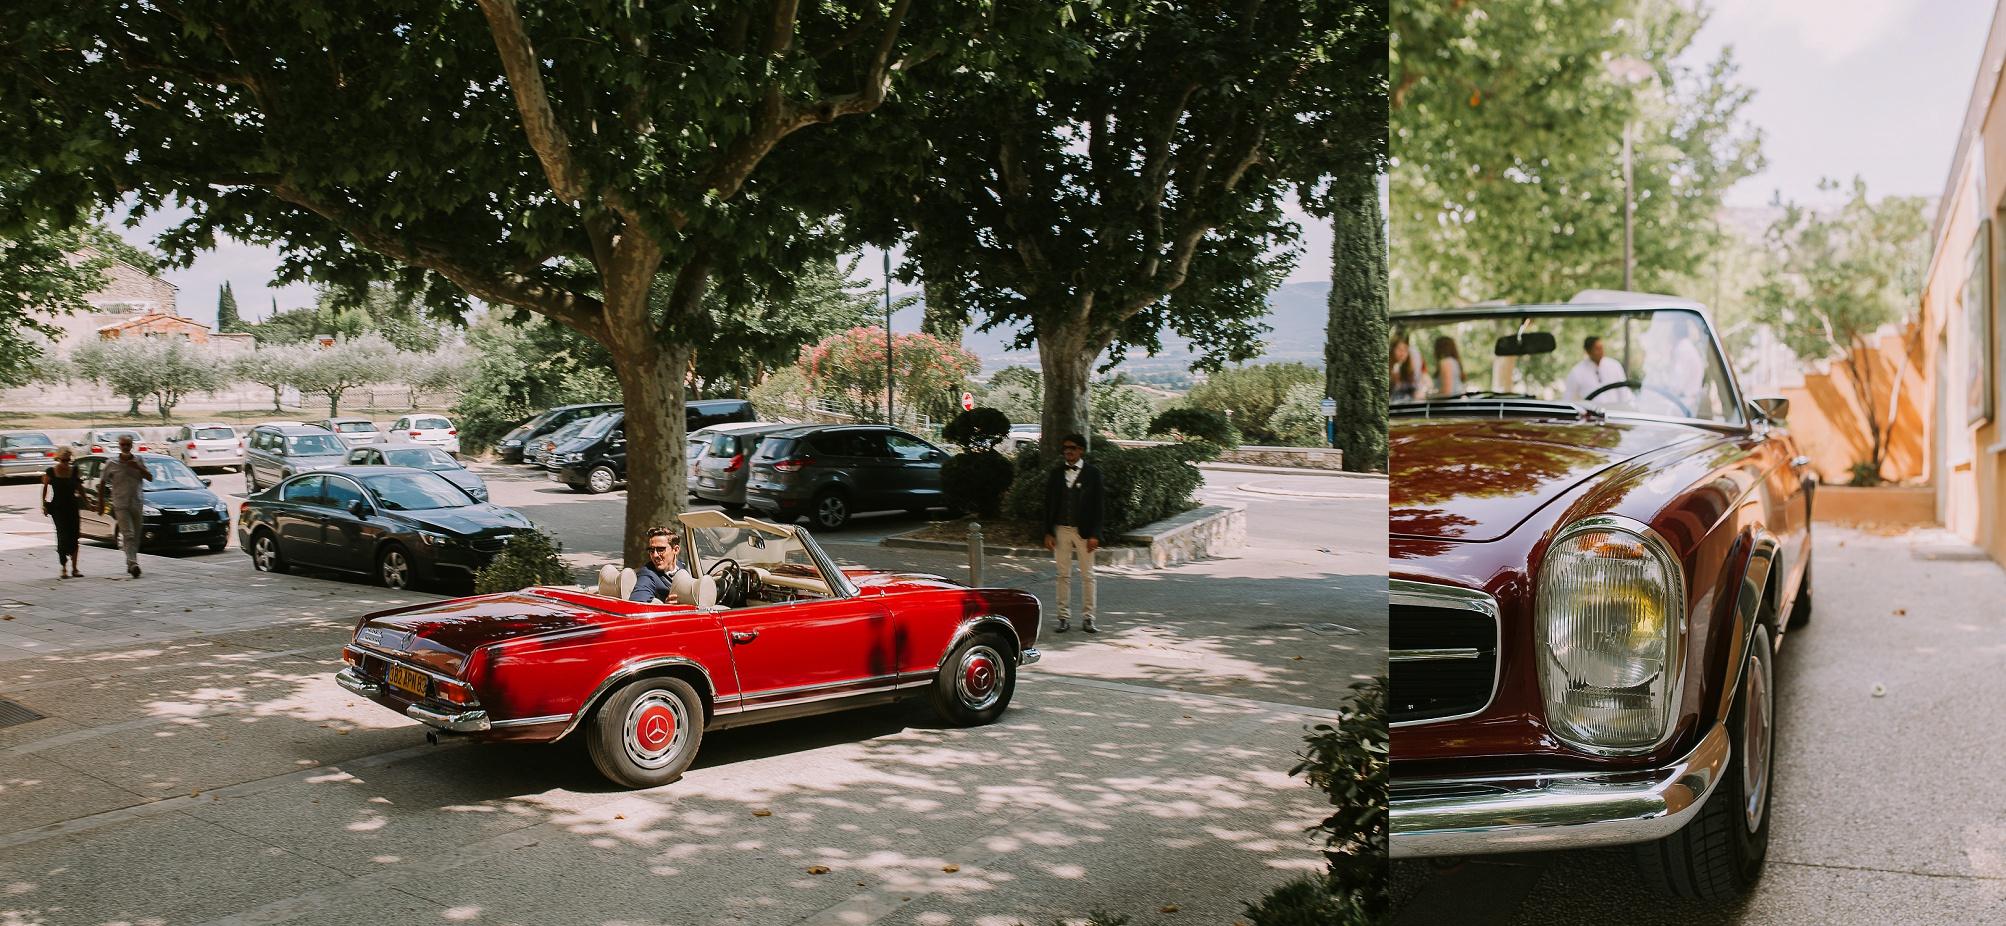 katerynaphotos-mariage-photographe-puyloubier-provence-aix-en-provence-sud-de-la-france_0346.jpg